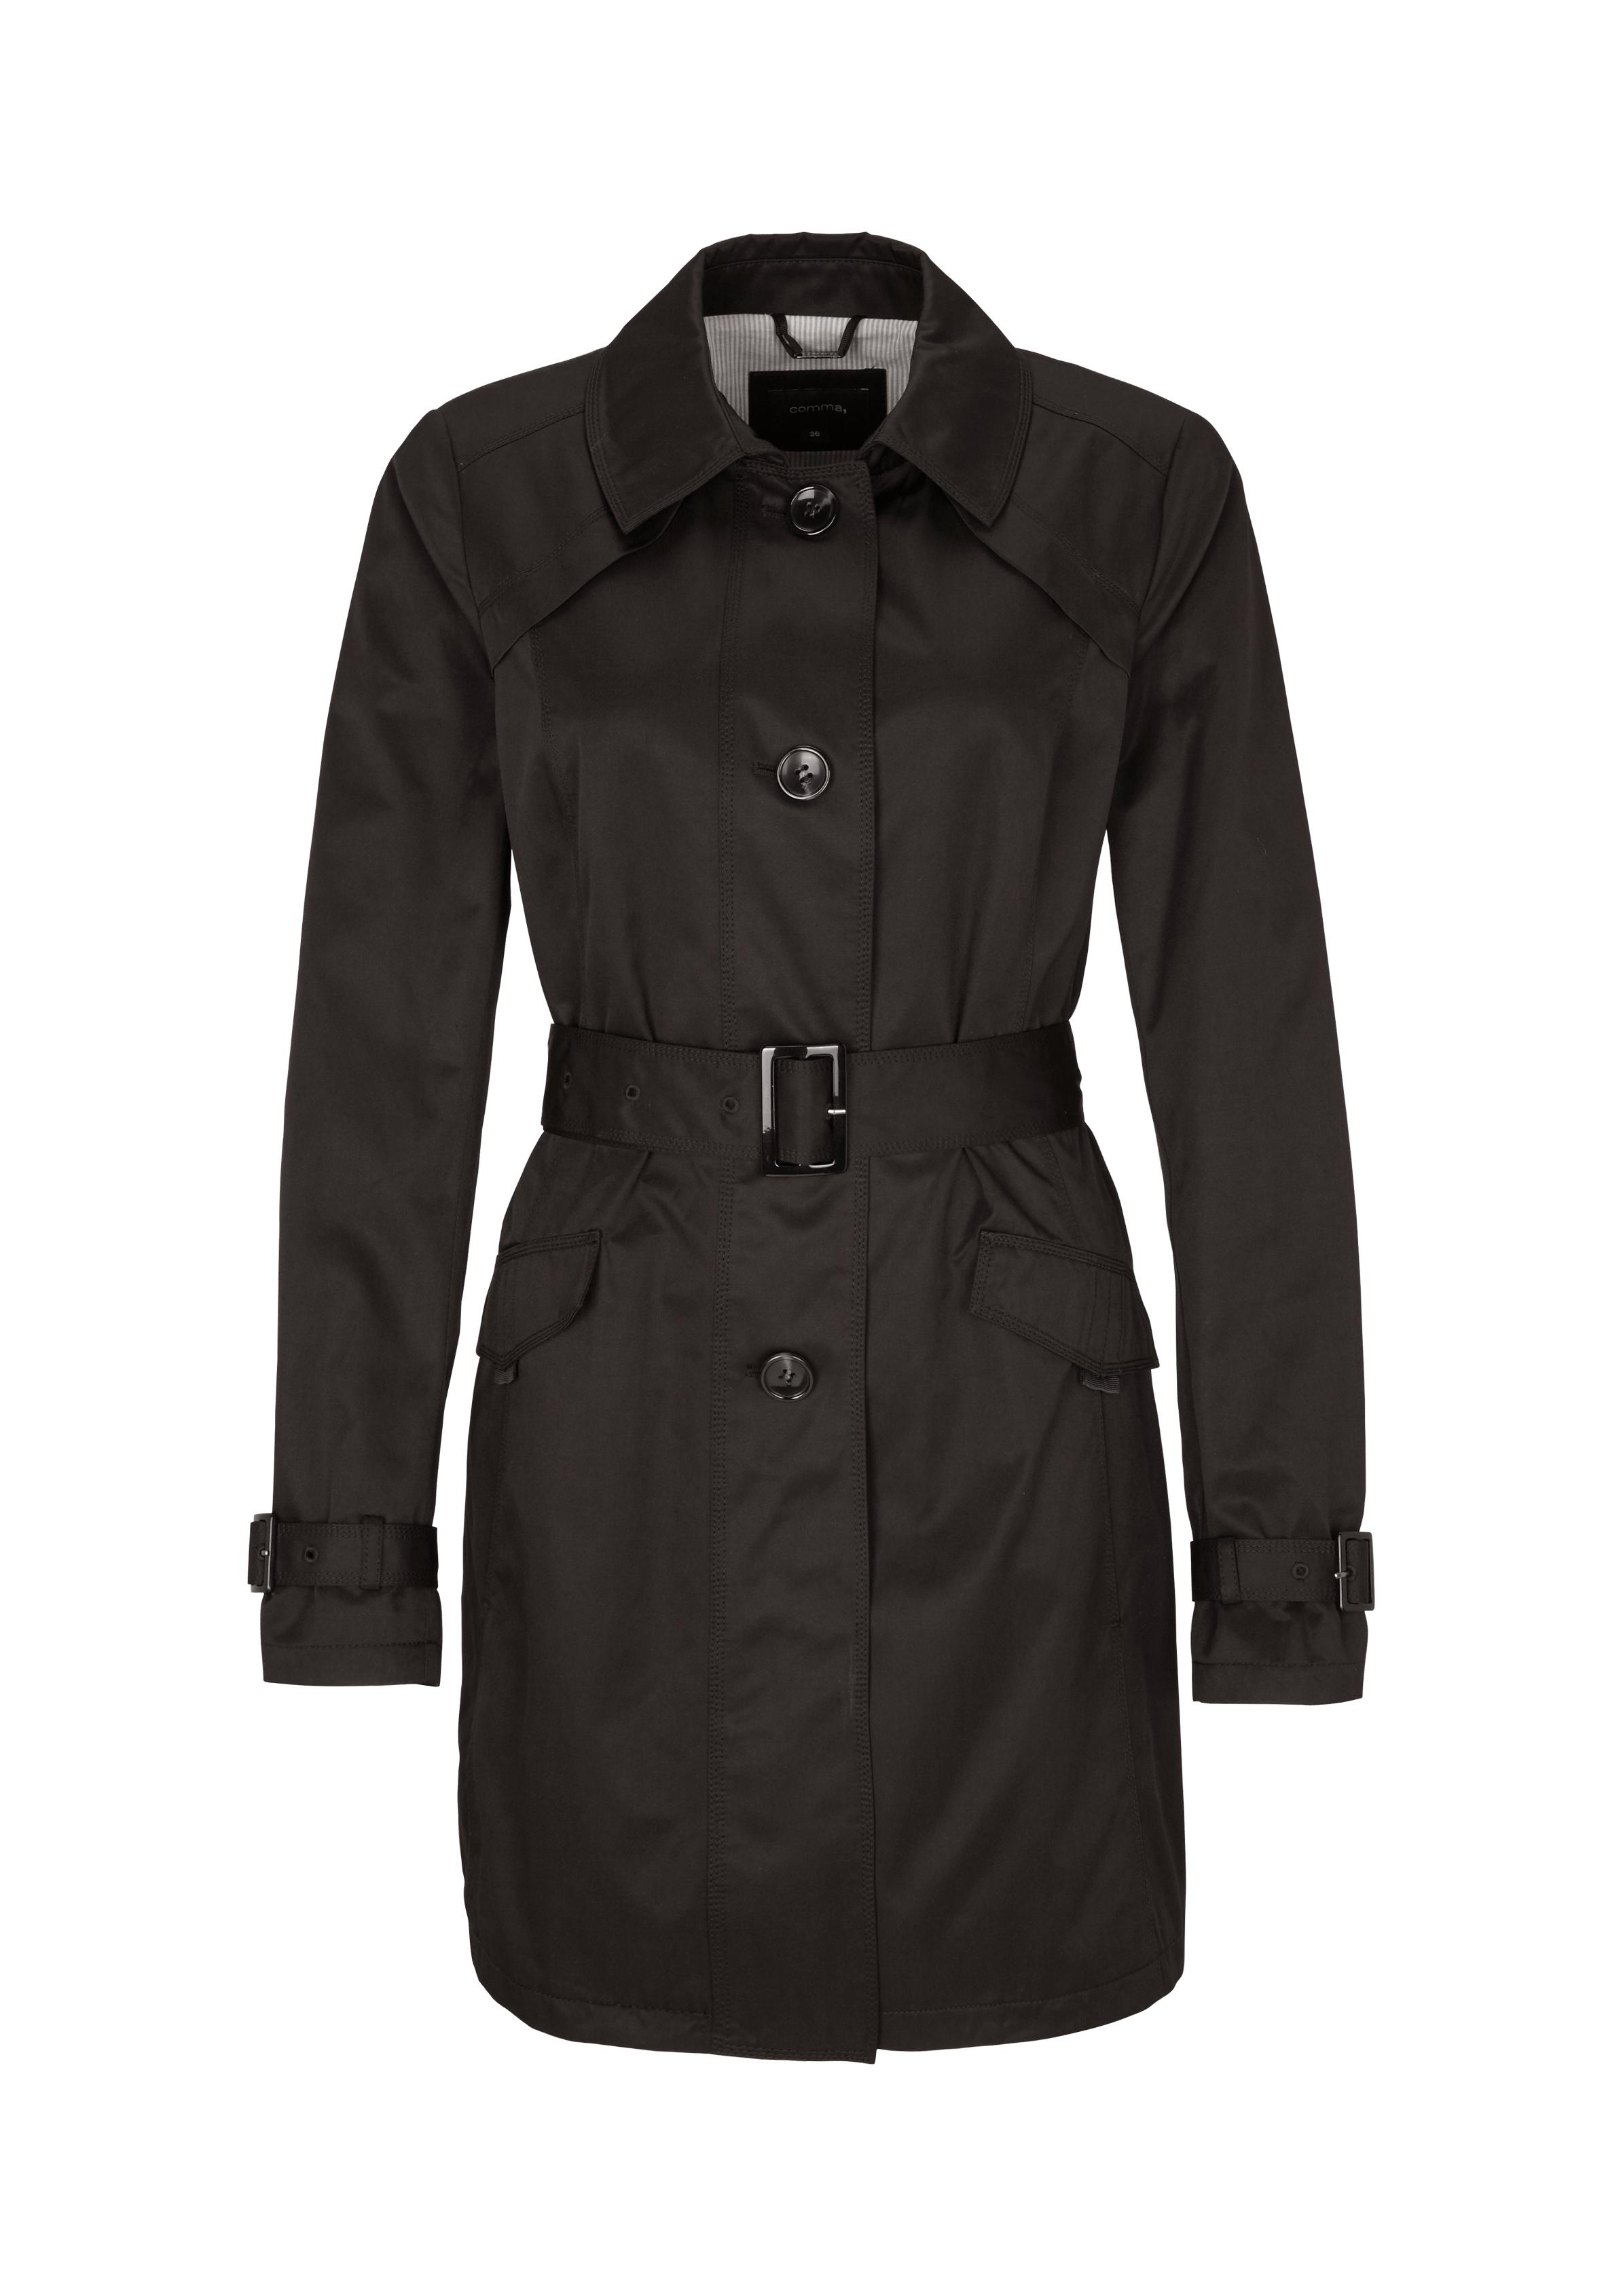 Trenchcoat | Bekleidung > Mäntel > Trenchcoats | Grau/schwarz | 50% baumwolle -  50% polyester | comma